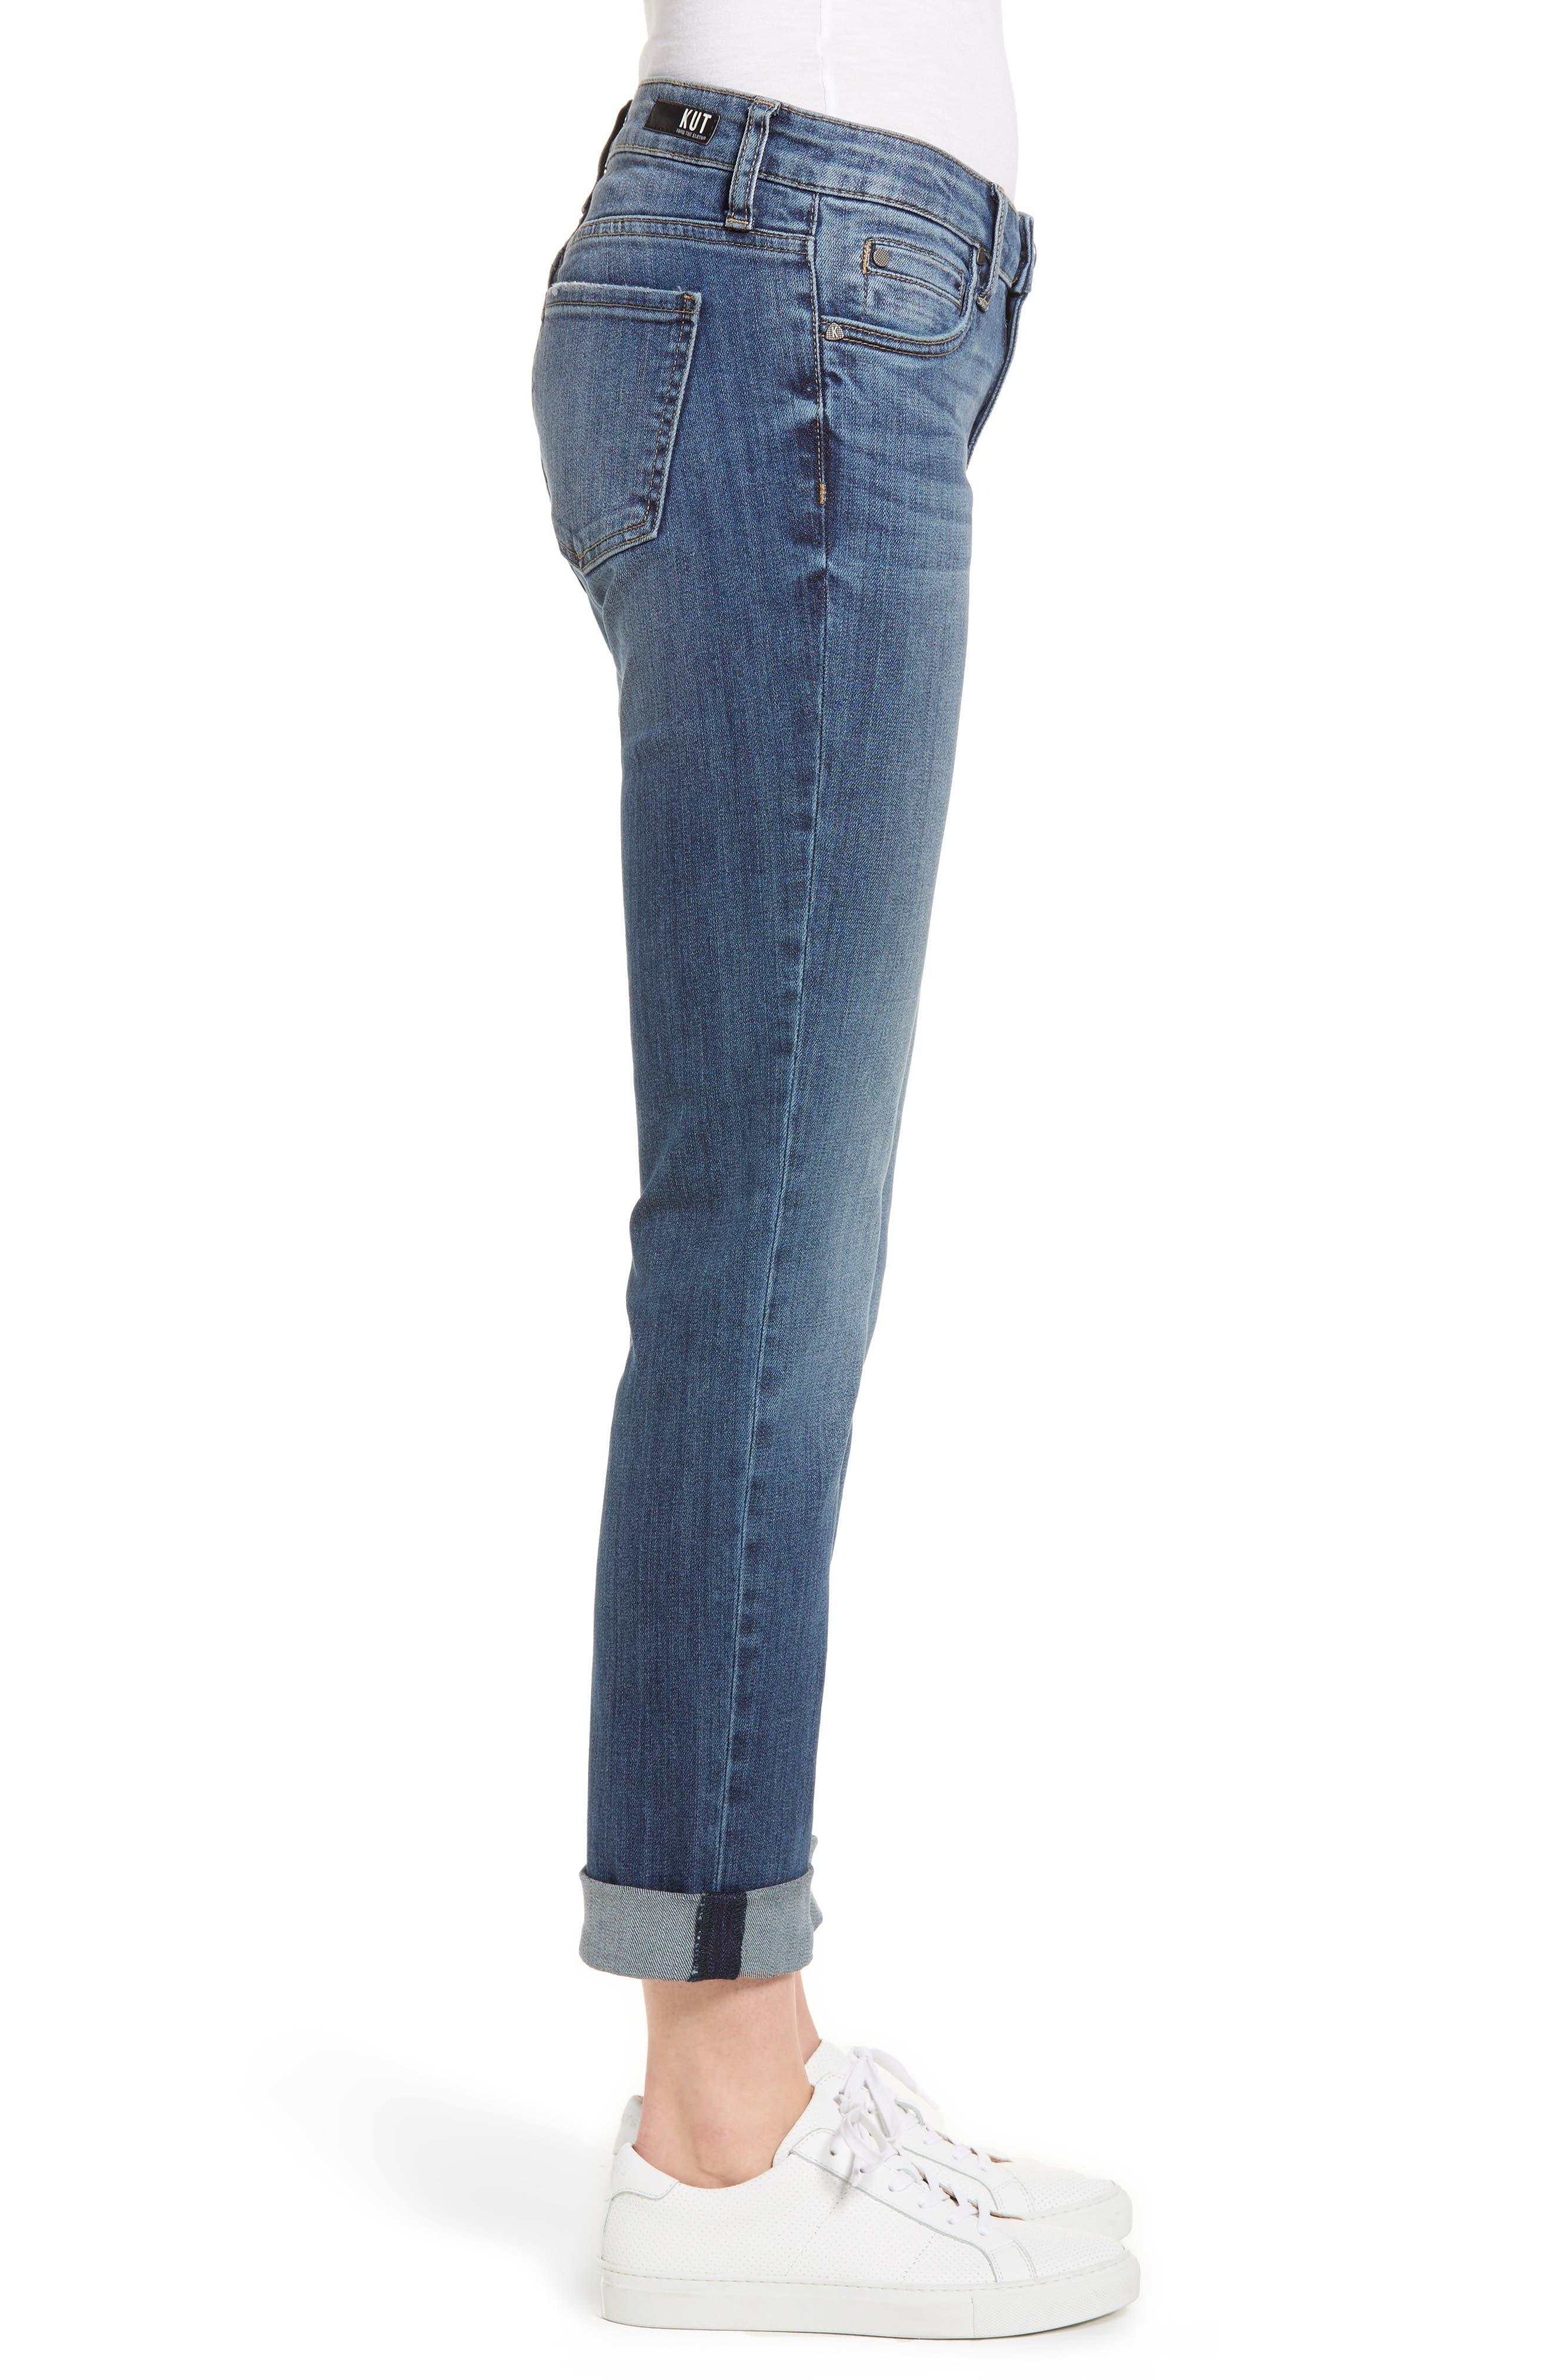 Catherine Boyfriend Jeans,                             Alternate thumbnail 3, color,                             Improvise